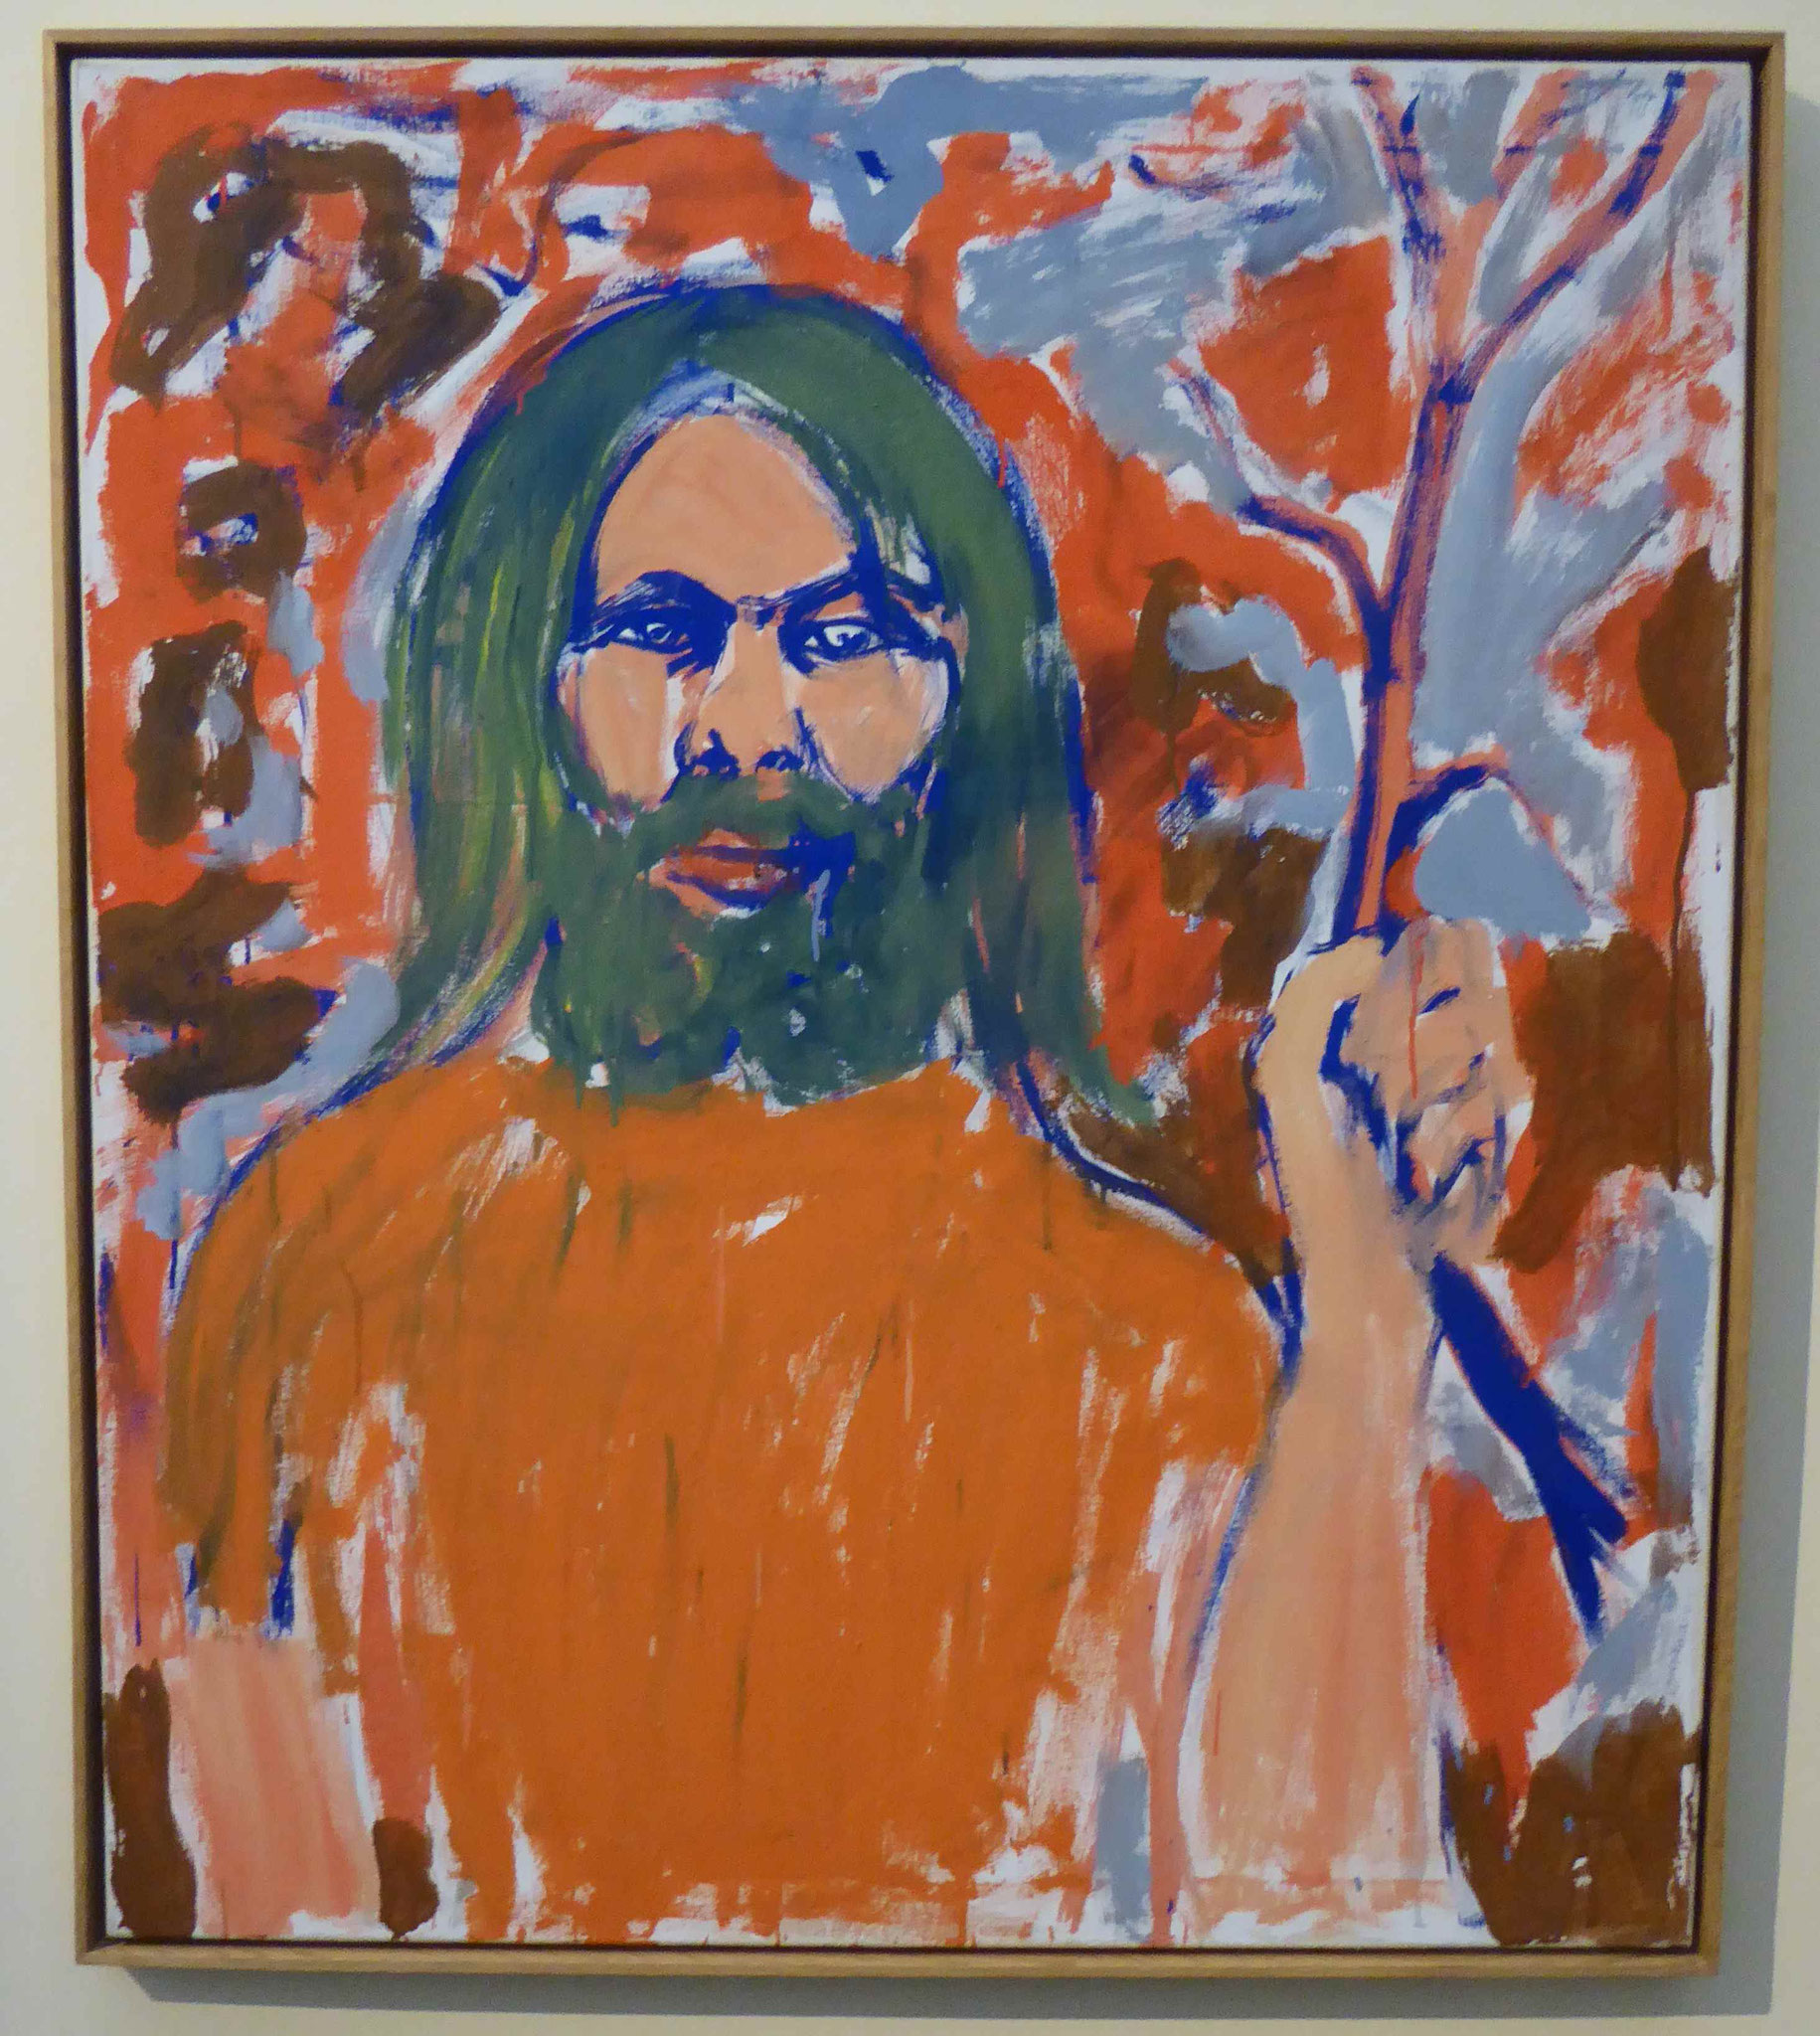 A.R. Penck, Selbstbildnis, 1976, Museum Moritzburg, Halle